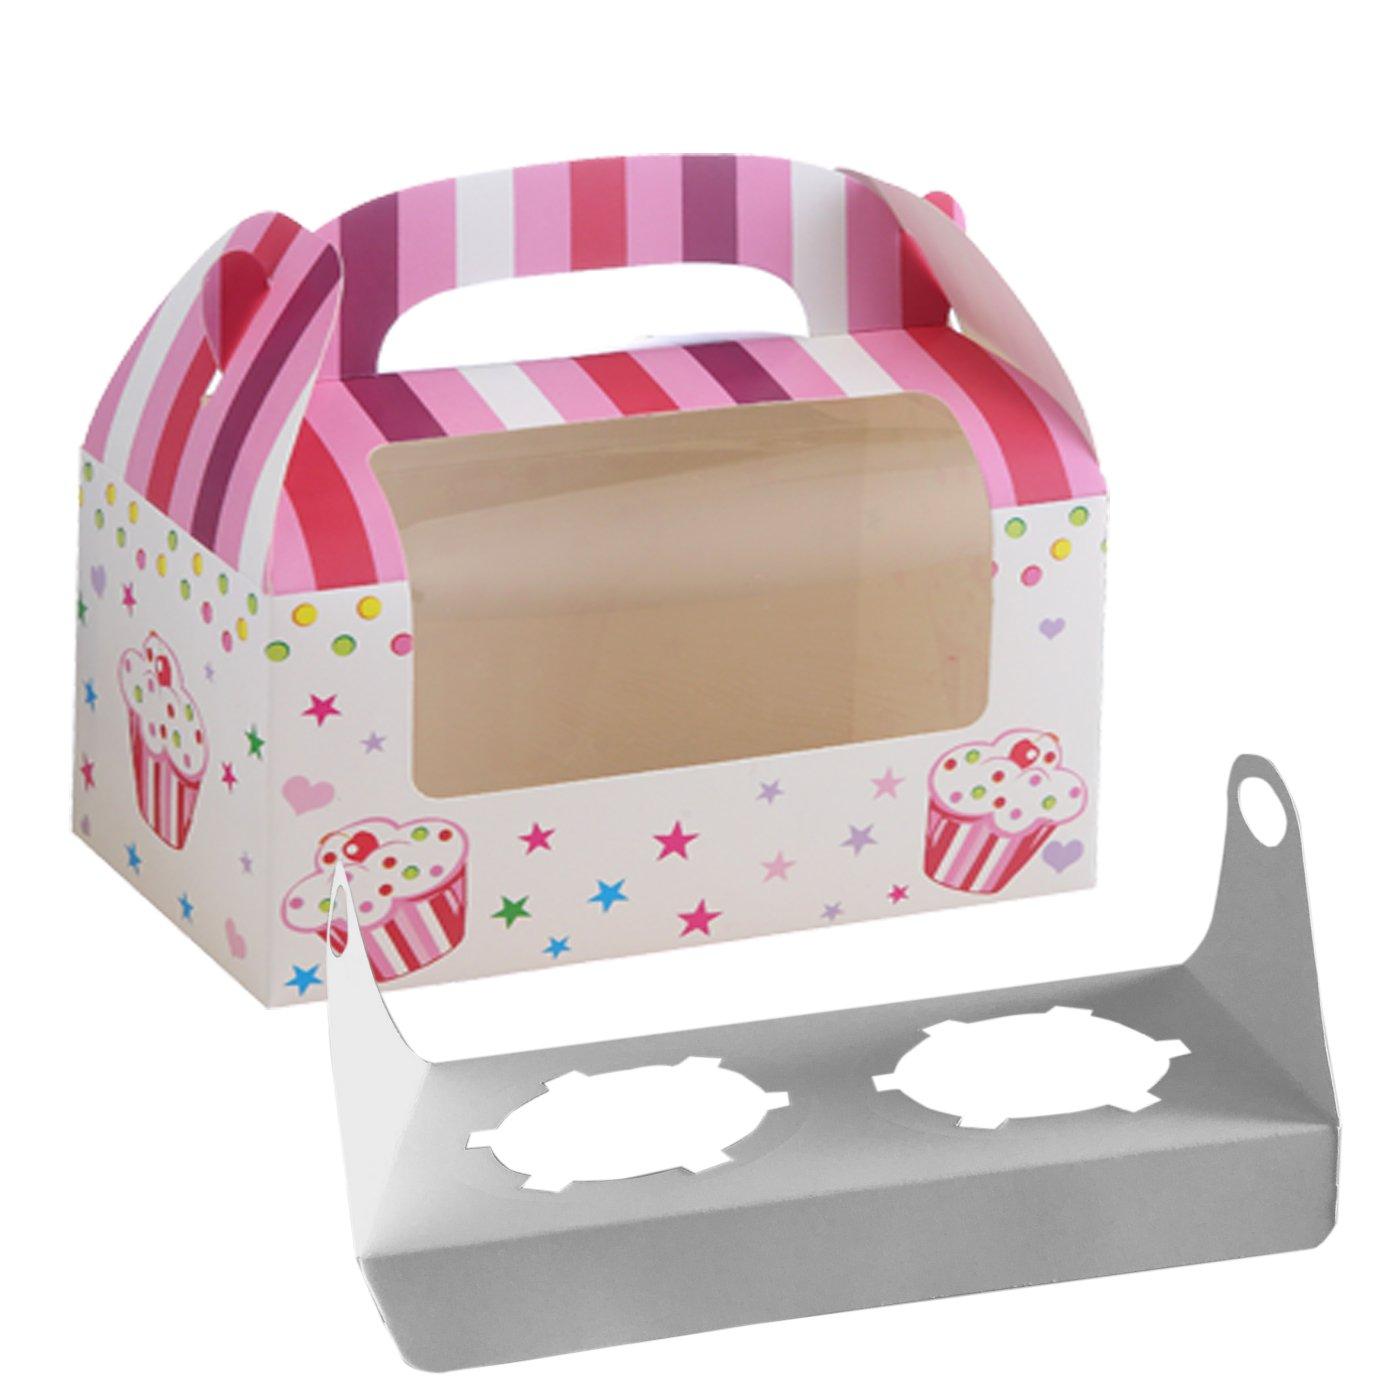 16 Cajas para Transportar 2 Magdalenas Decoradas, con Ventana y Asa para Decoracion de Boda Cake de Caja Plegable Diseño Niña Color Rosa cotigo